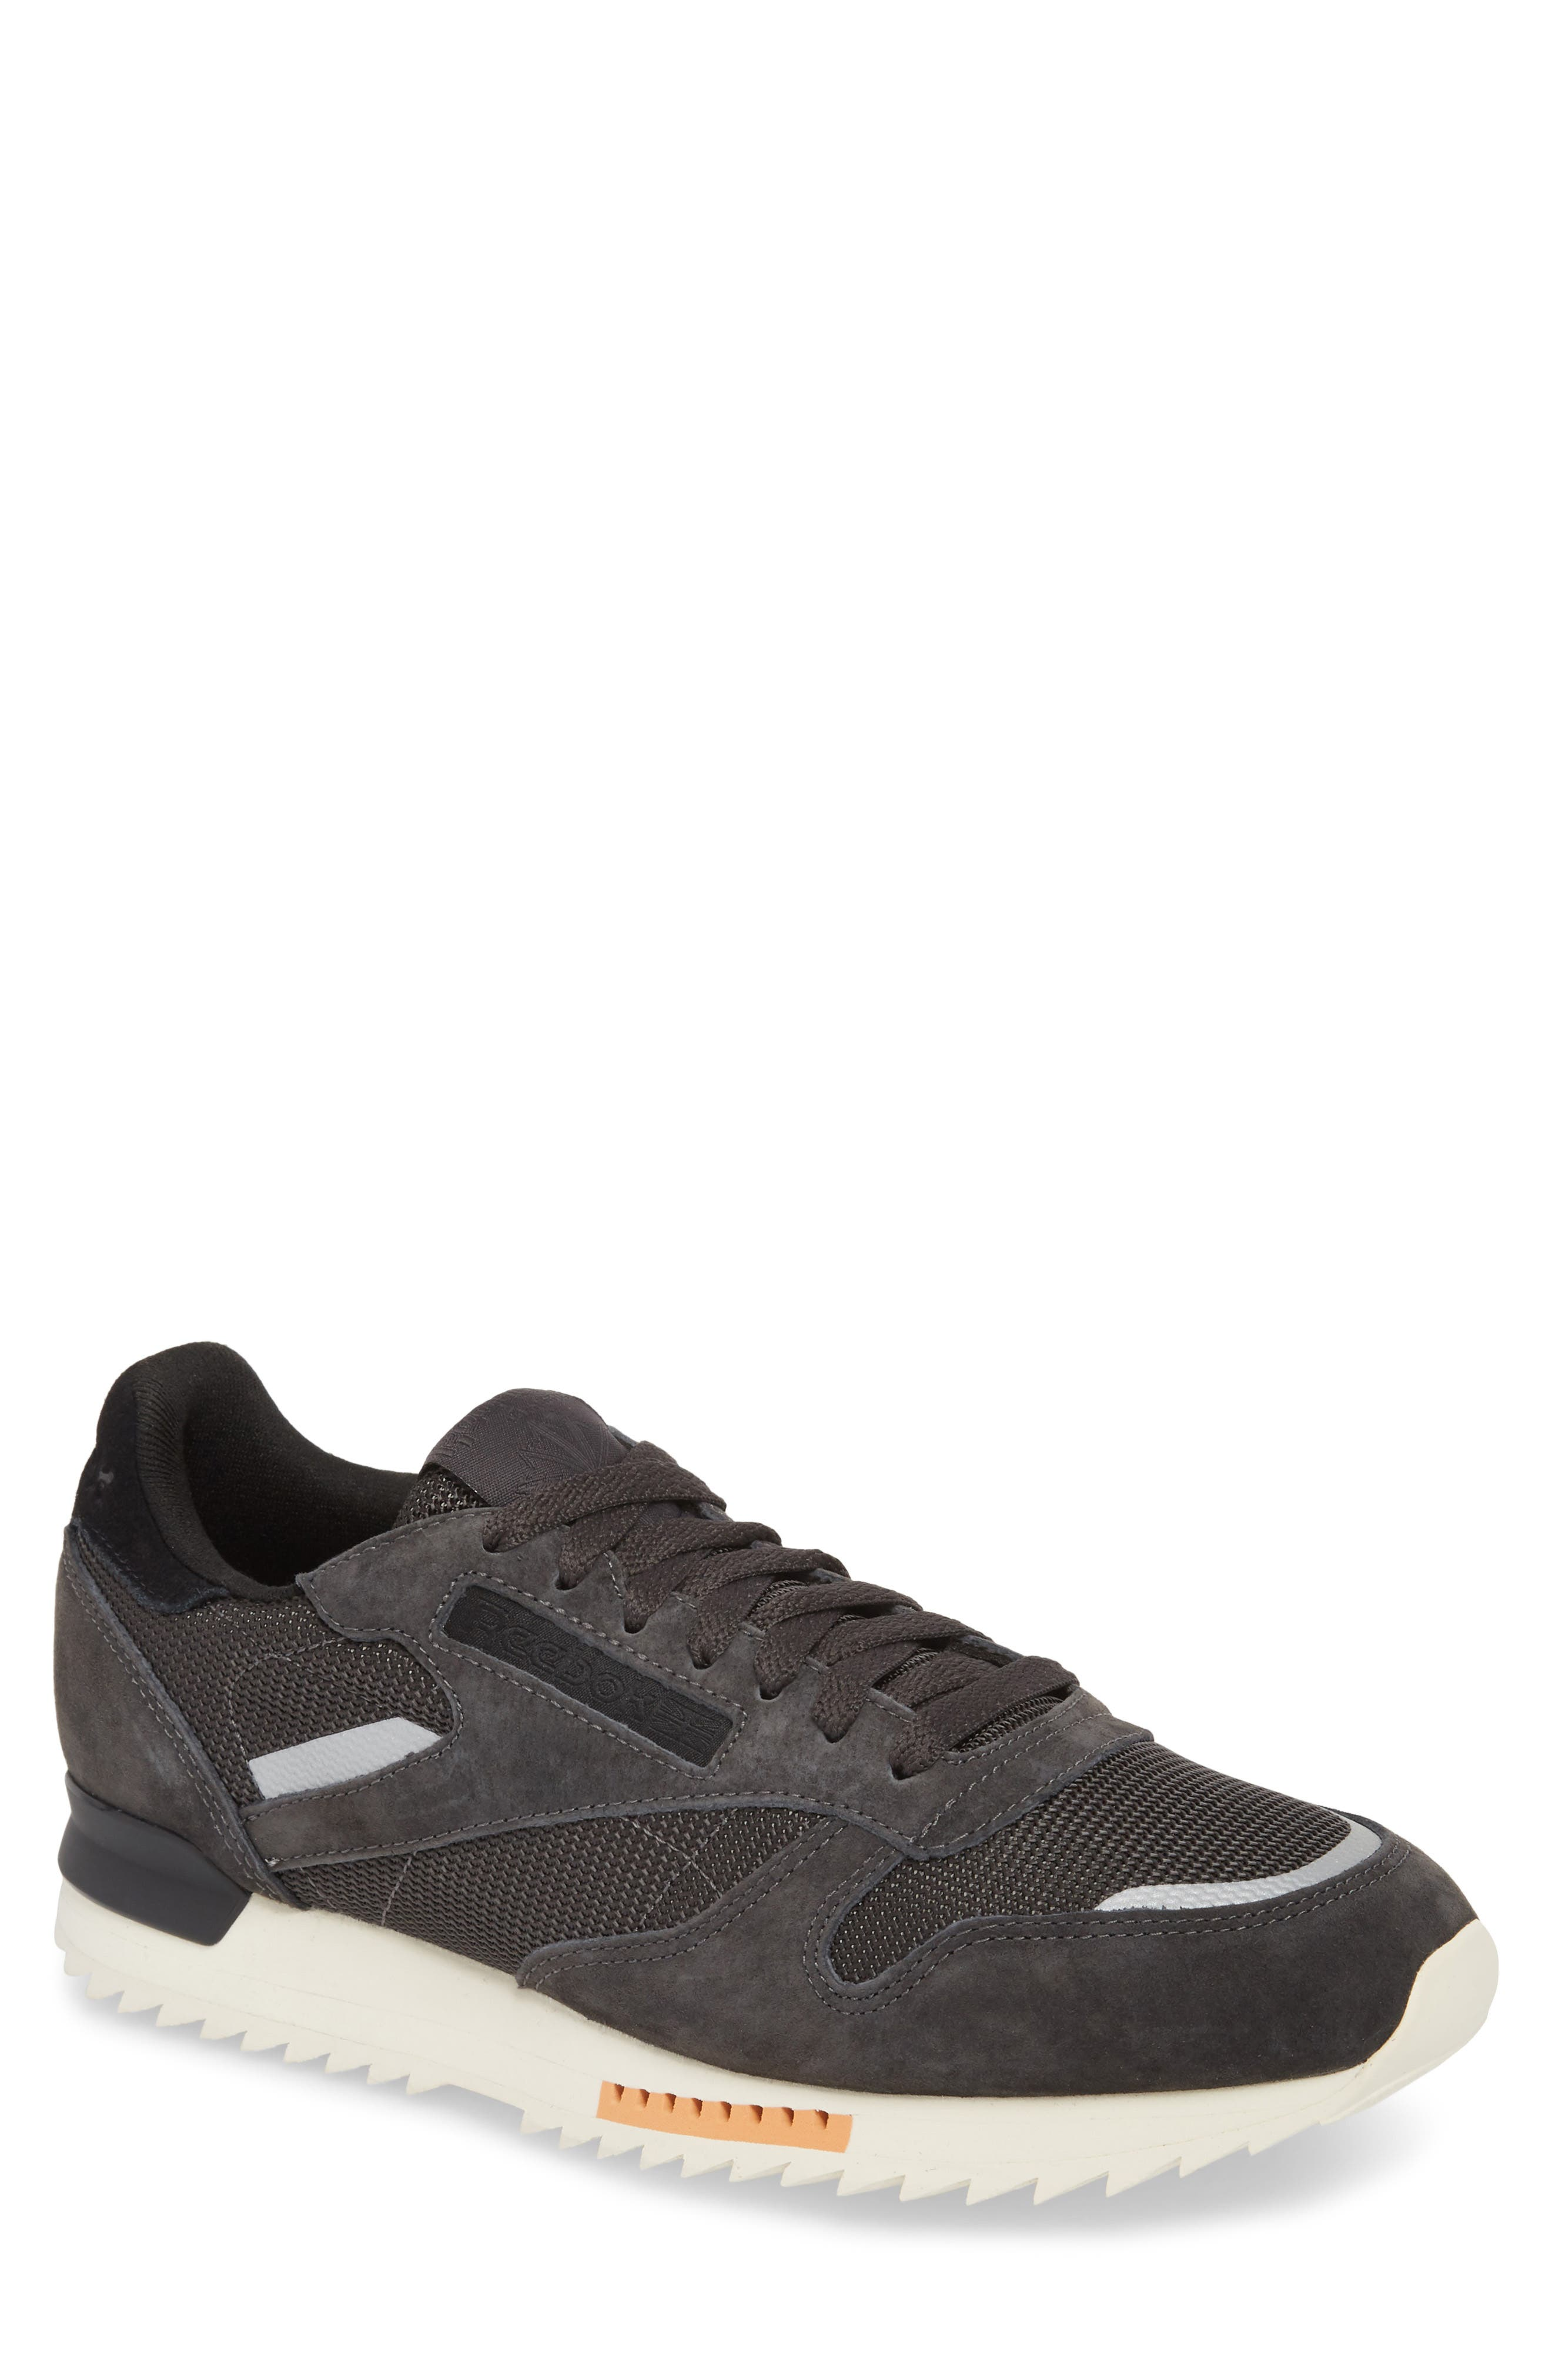 Classic Leather Ripple Sneaker,                             Main thumbnail 1, color,                             Coal/ Grey/ White/ Black/ Dust